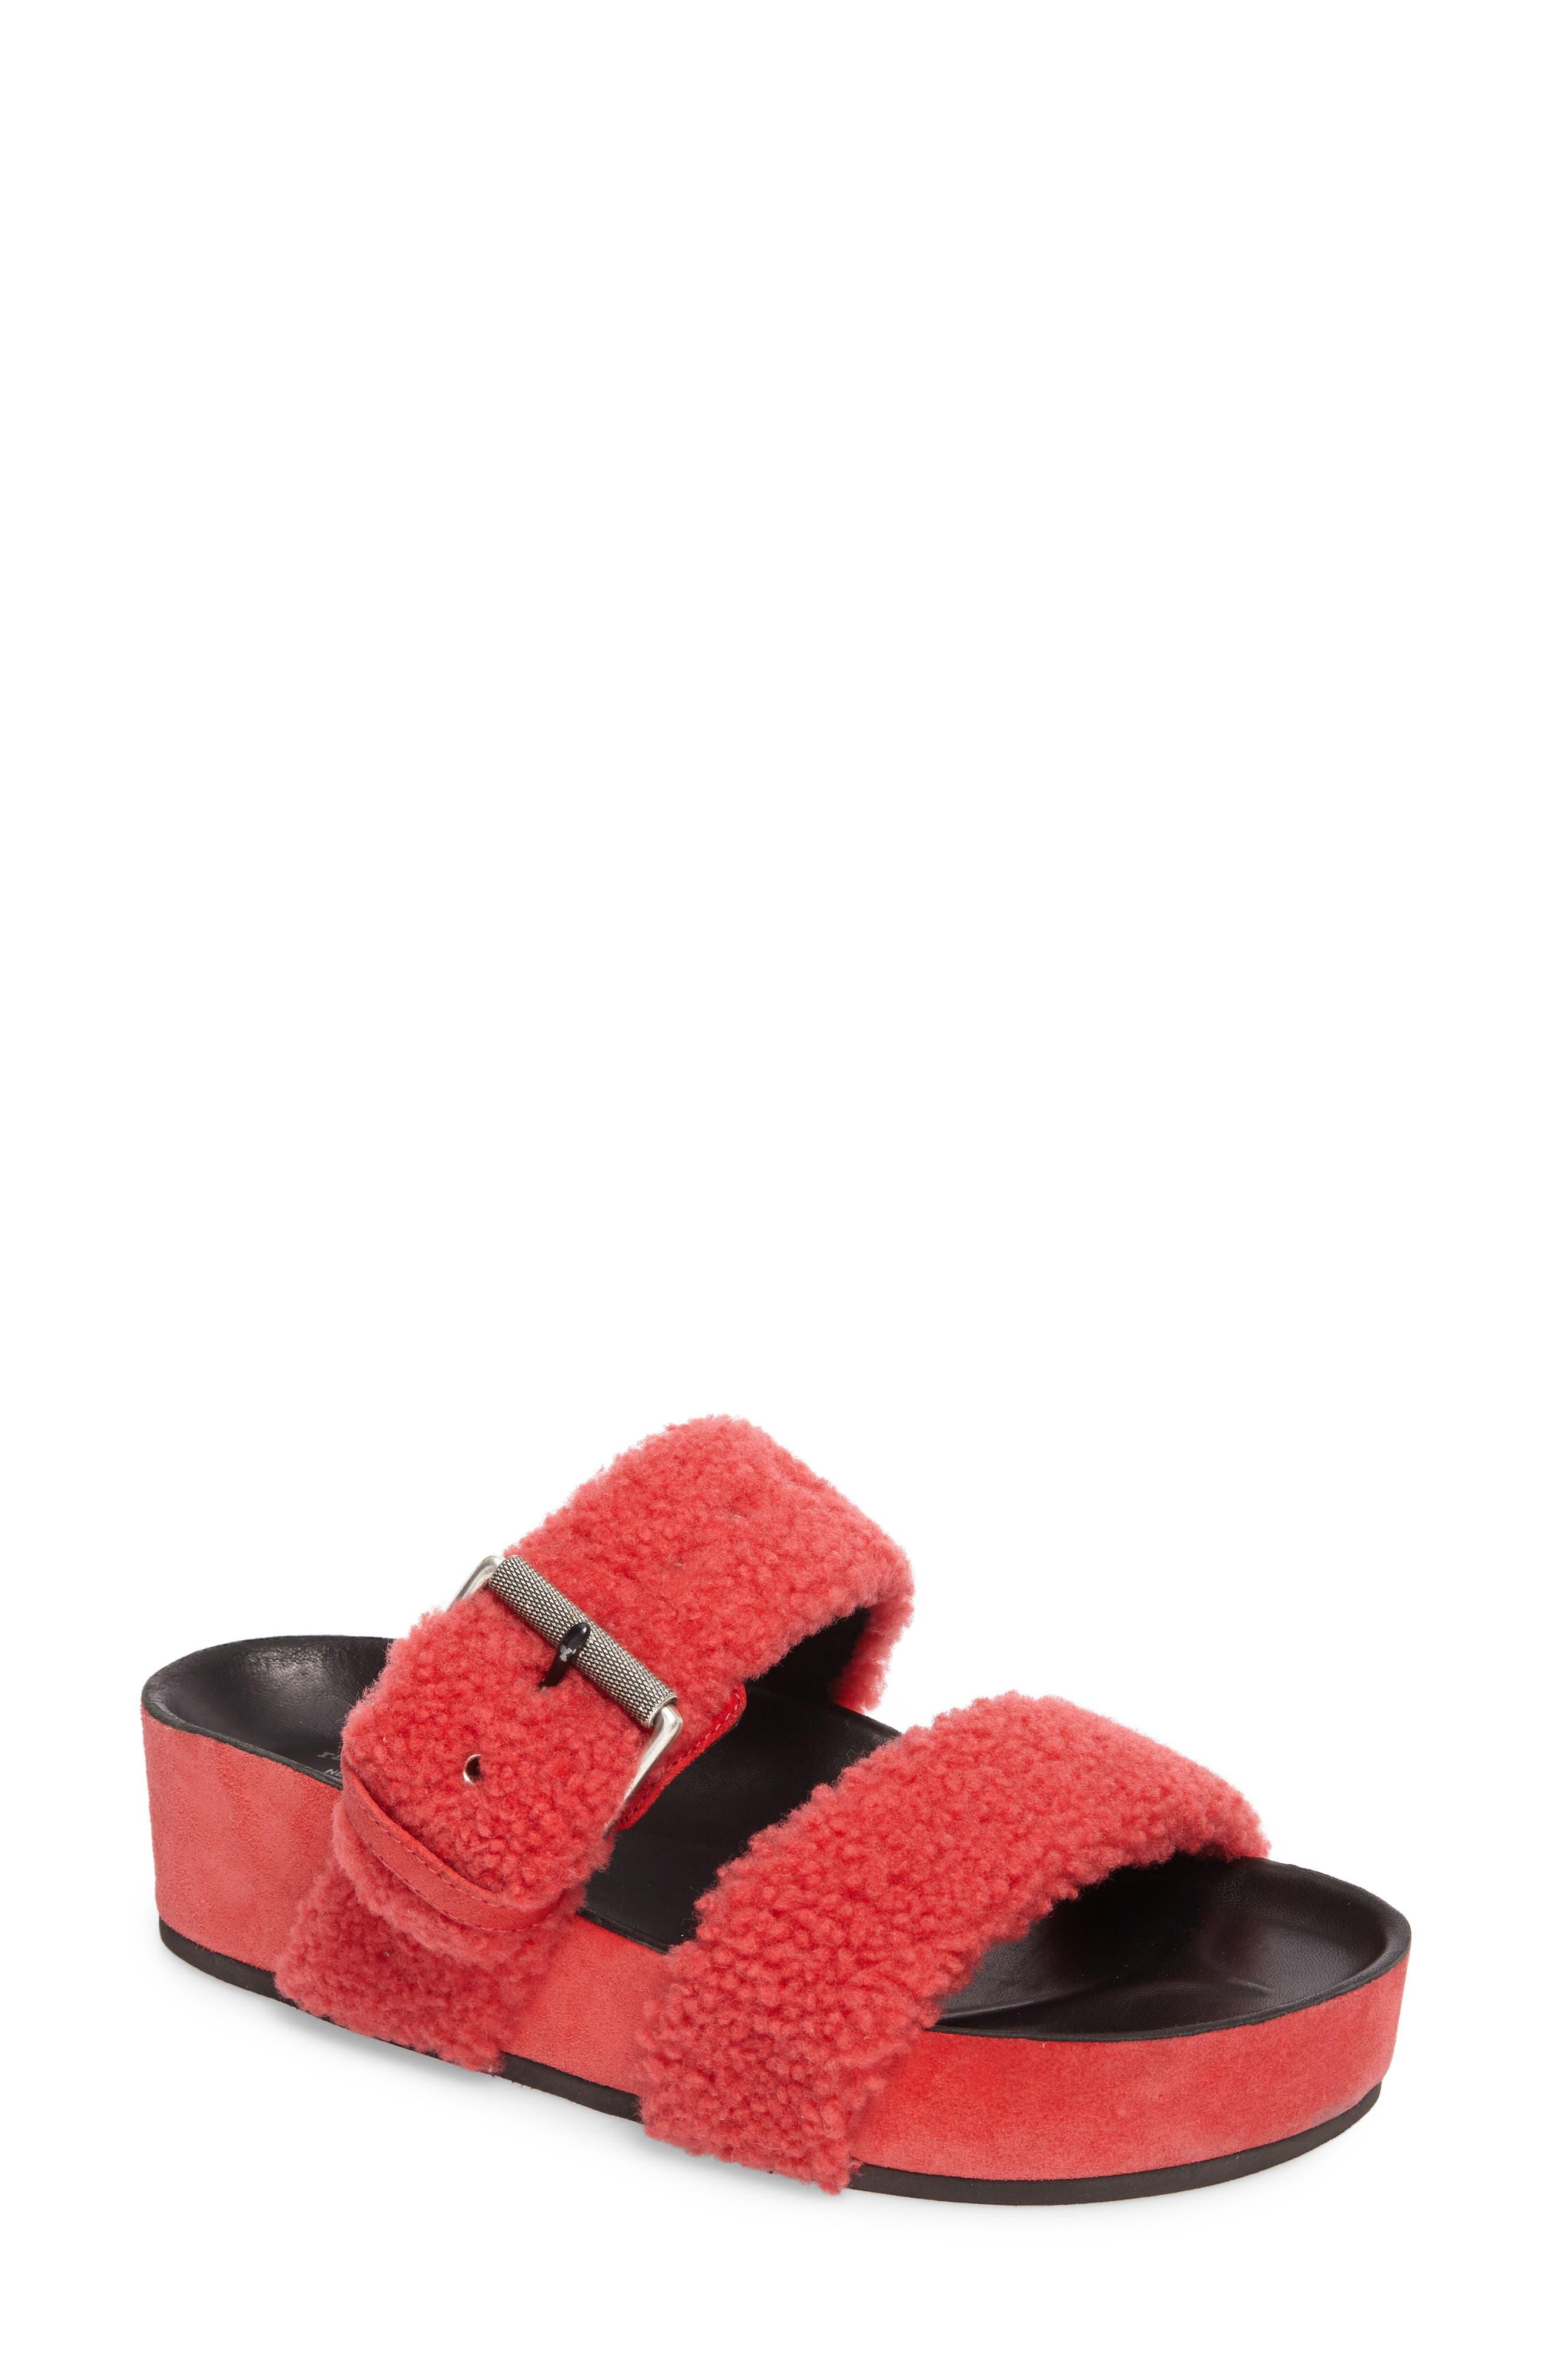 Evin Genuine Shearling Slide Sandal,                             Main thumbnail 1, color,                             Berry